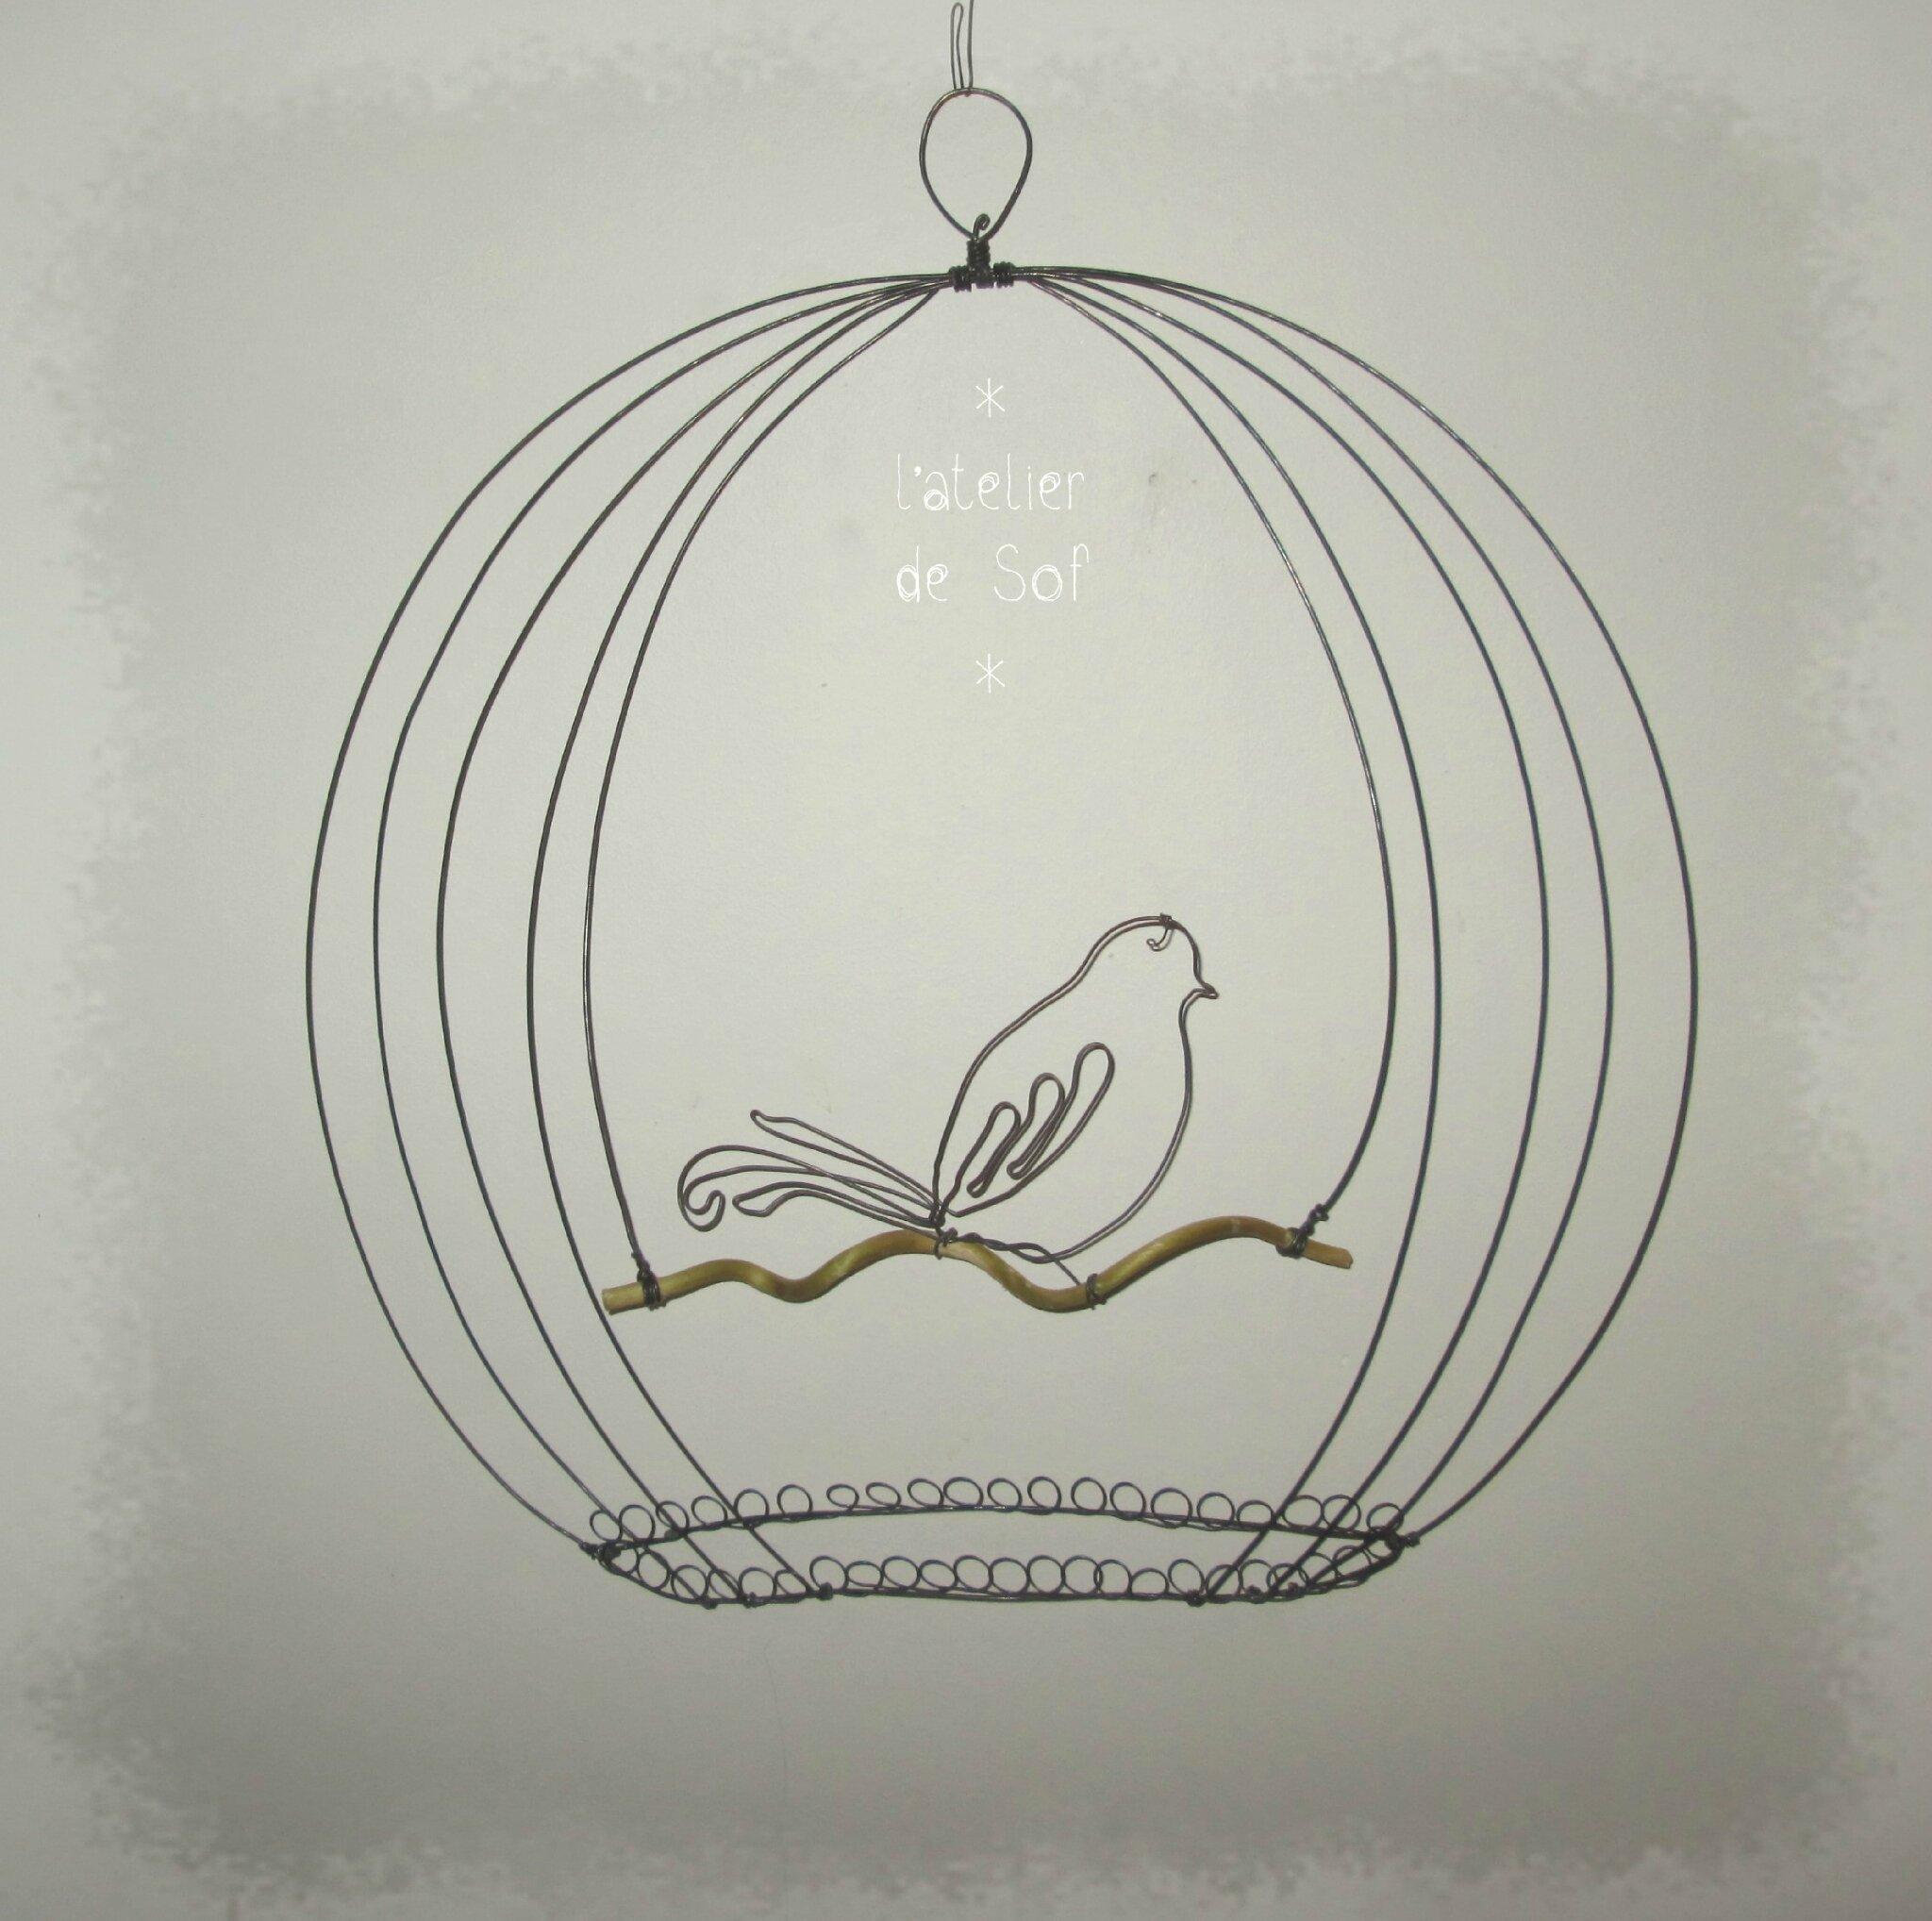 oiseau cage 2 dimensions